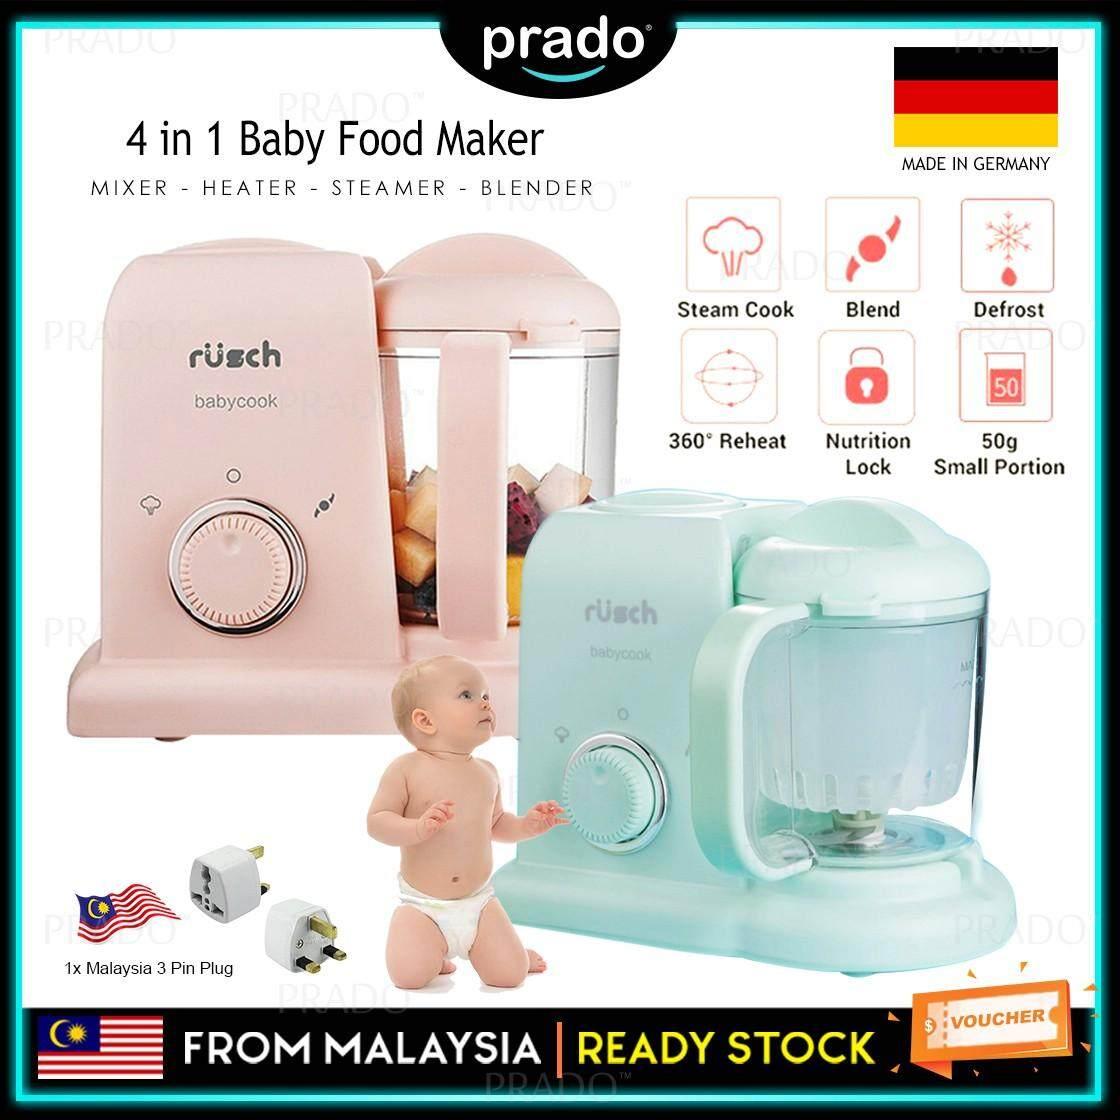 Prado Malaysia Germany Rusch 4 In 1 Baby Food Maker Mixer Grinder Heater Steamer Blender Babycook